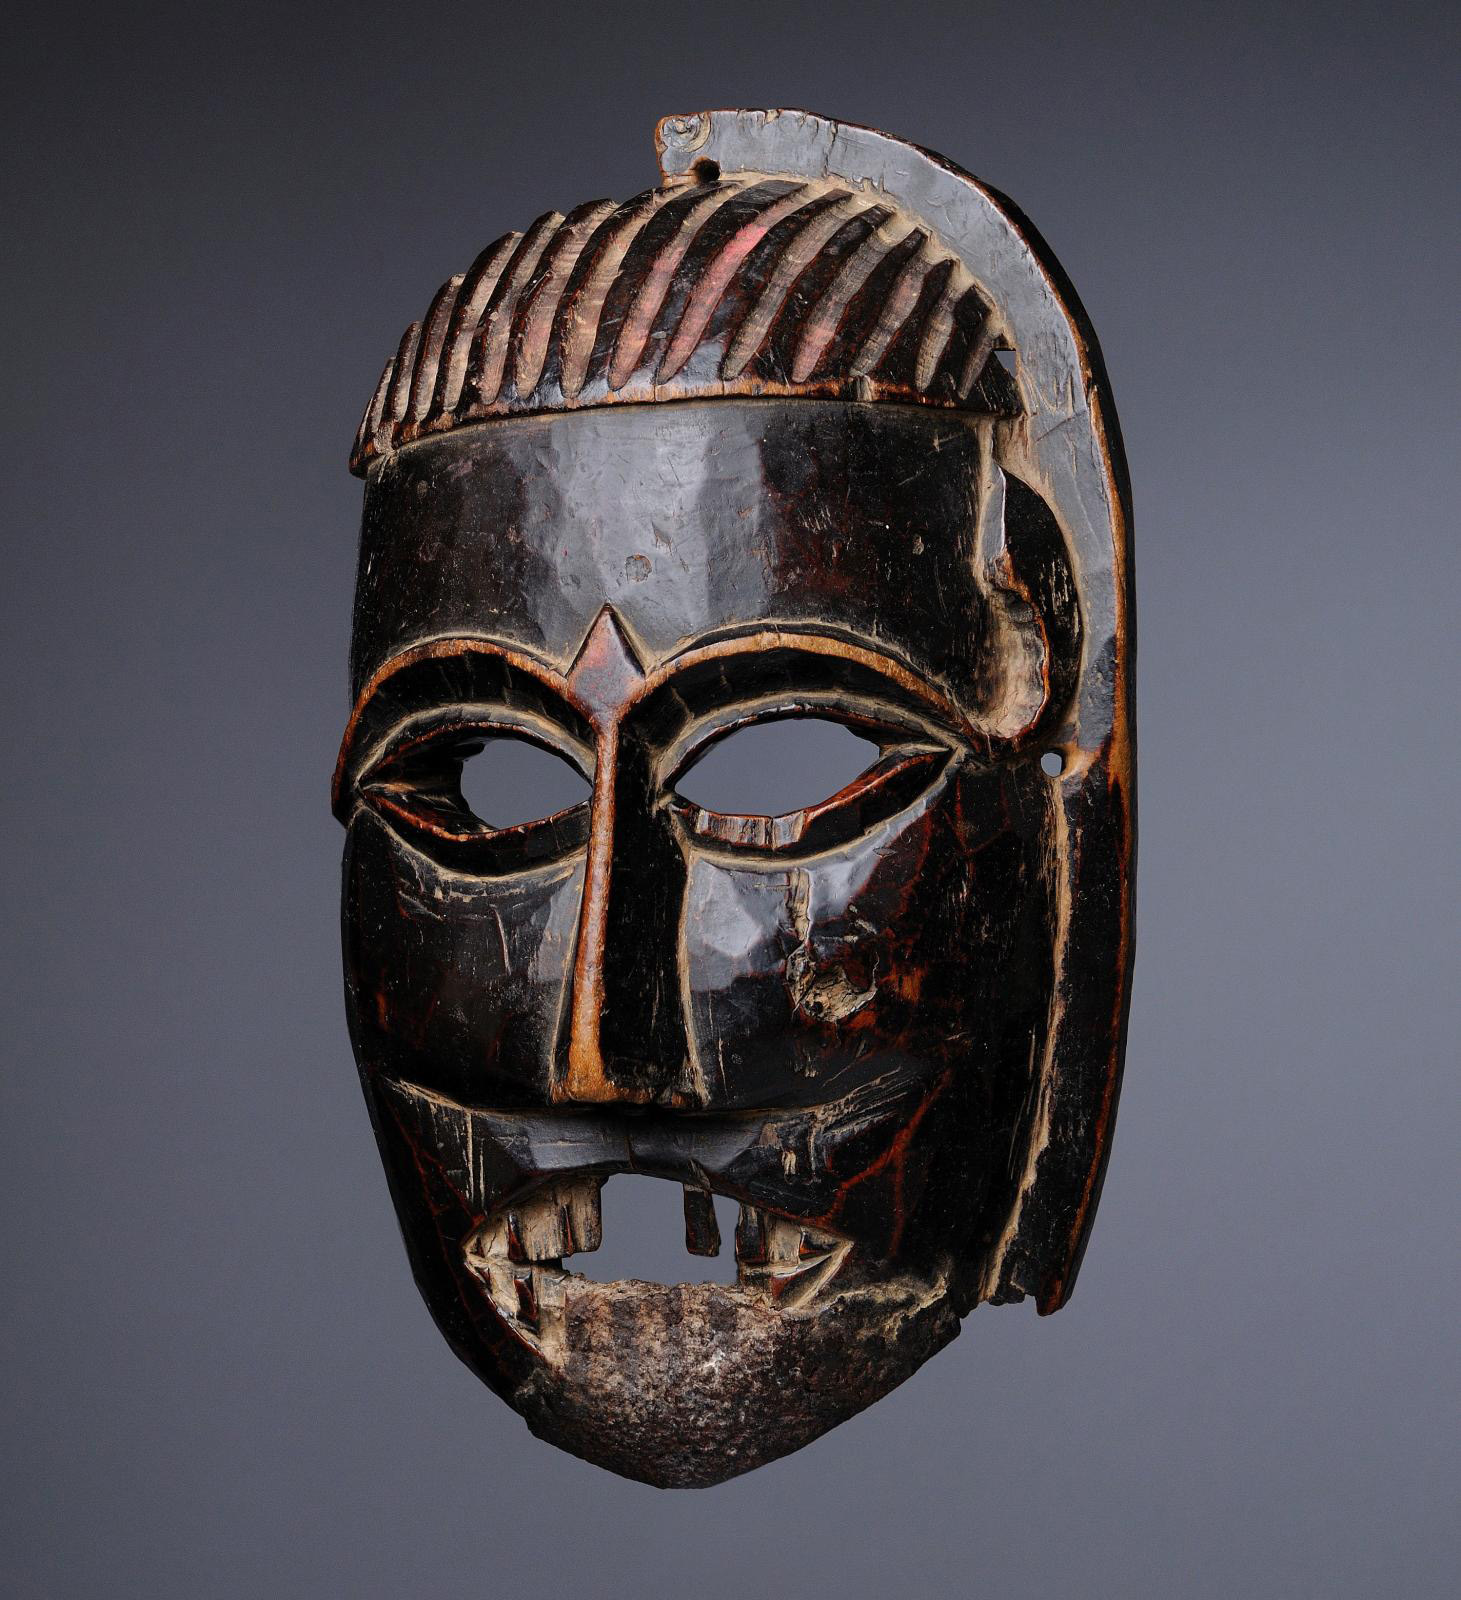 India, Kulu valley, Himachal Pradesh, c. 16th century. Mask used during the Phagli festivities, wood.© Photo Bertrand Holsnyder